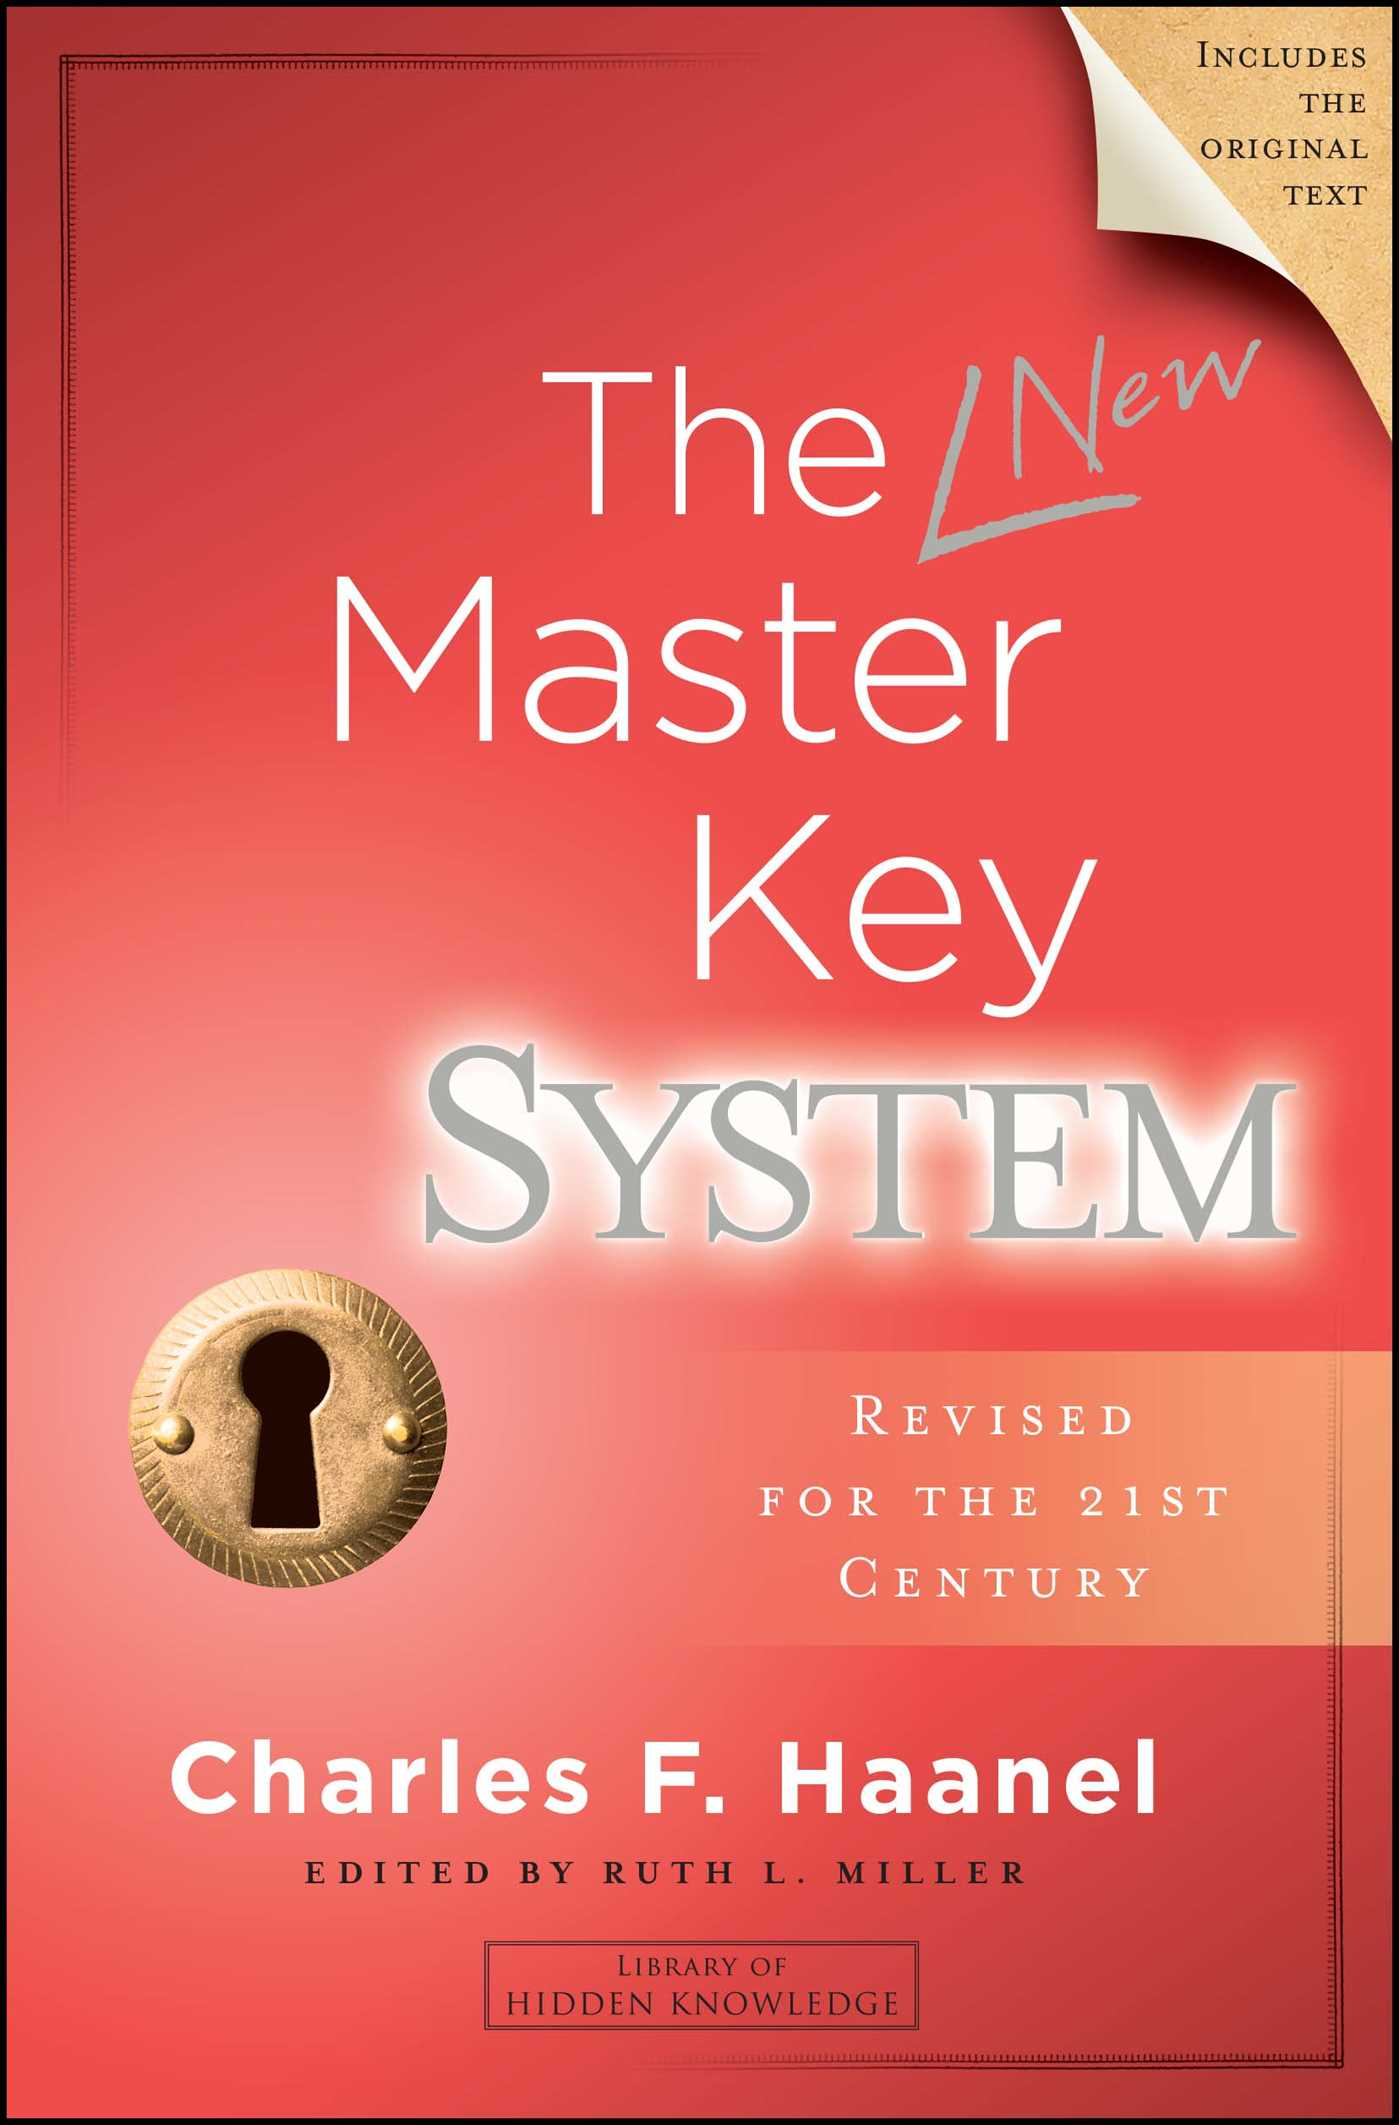 The new master key system 9781416587668 hr